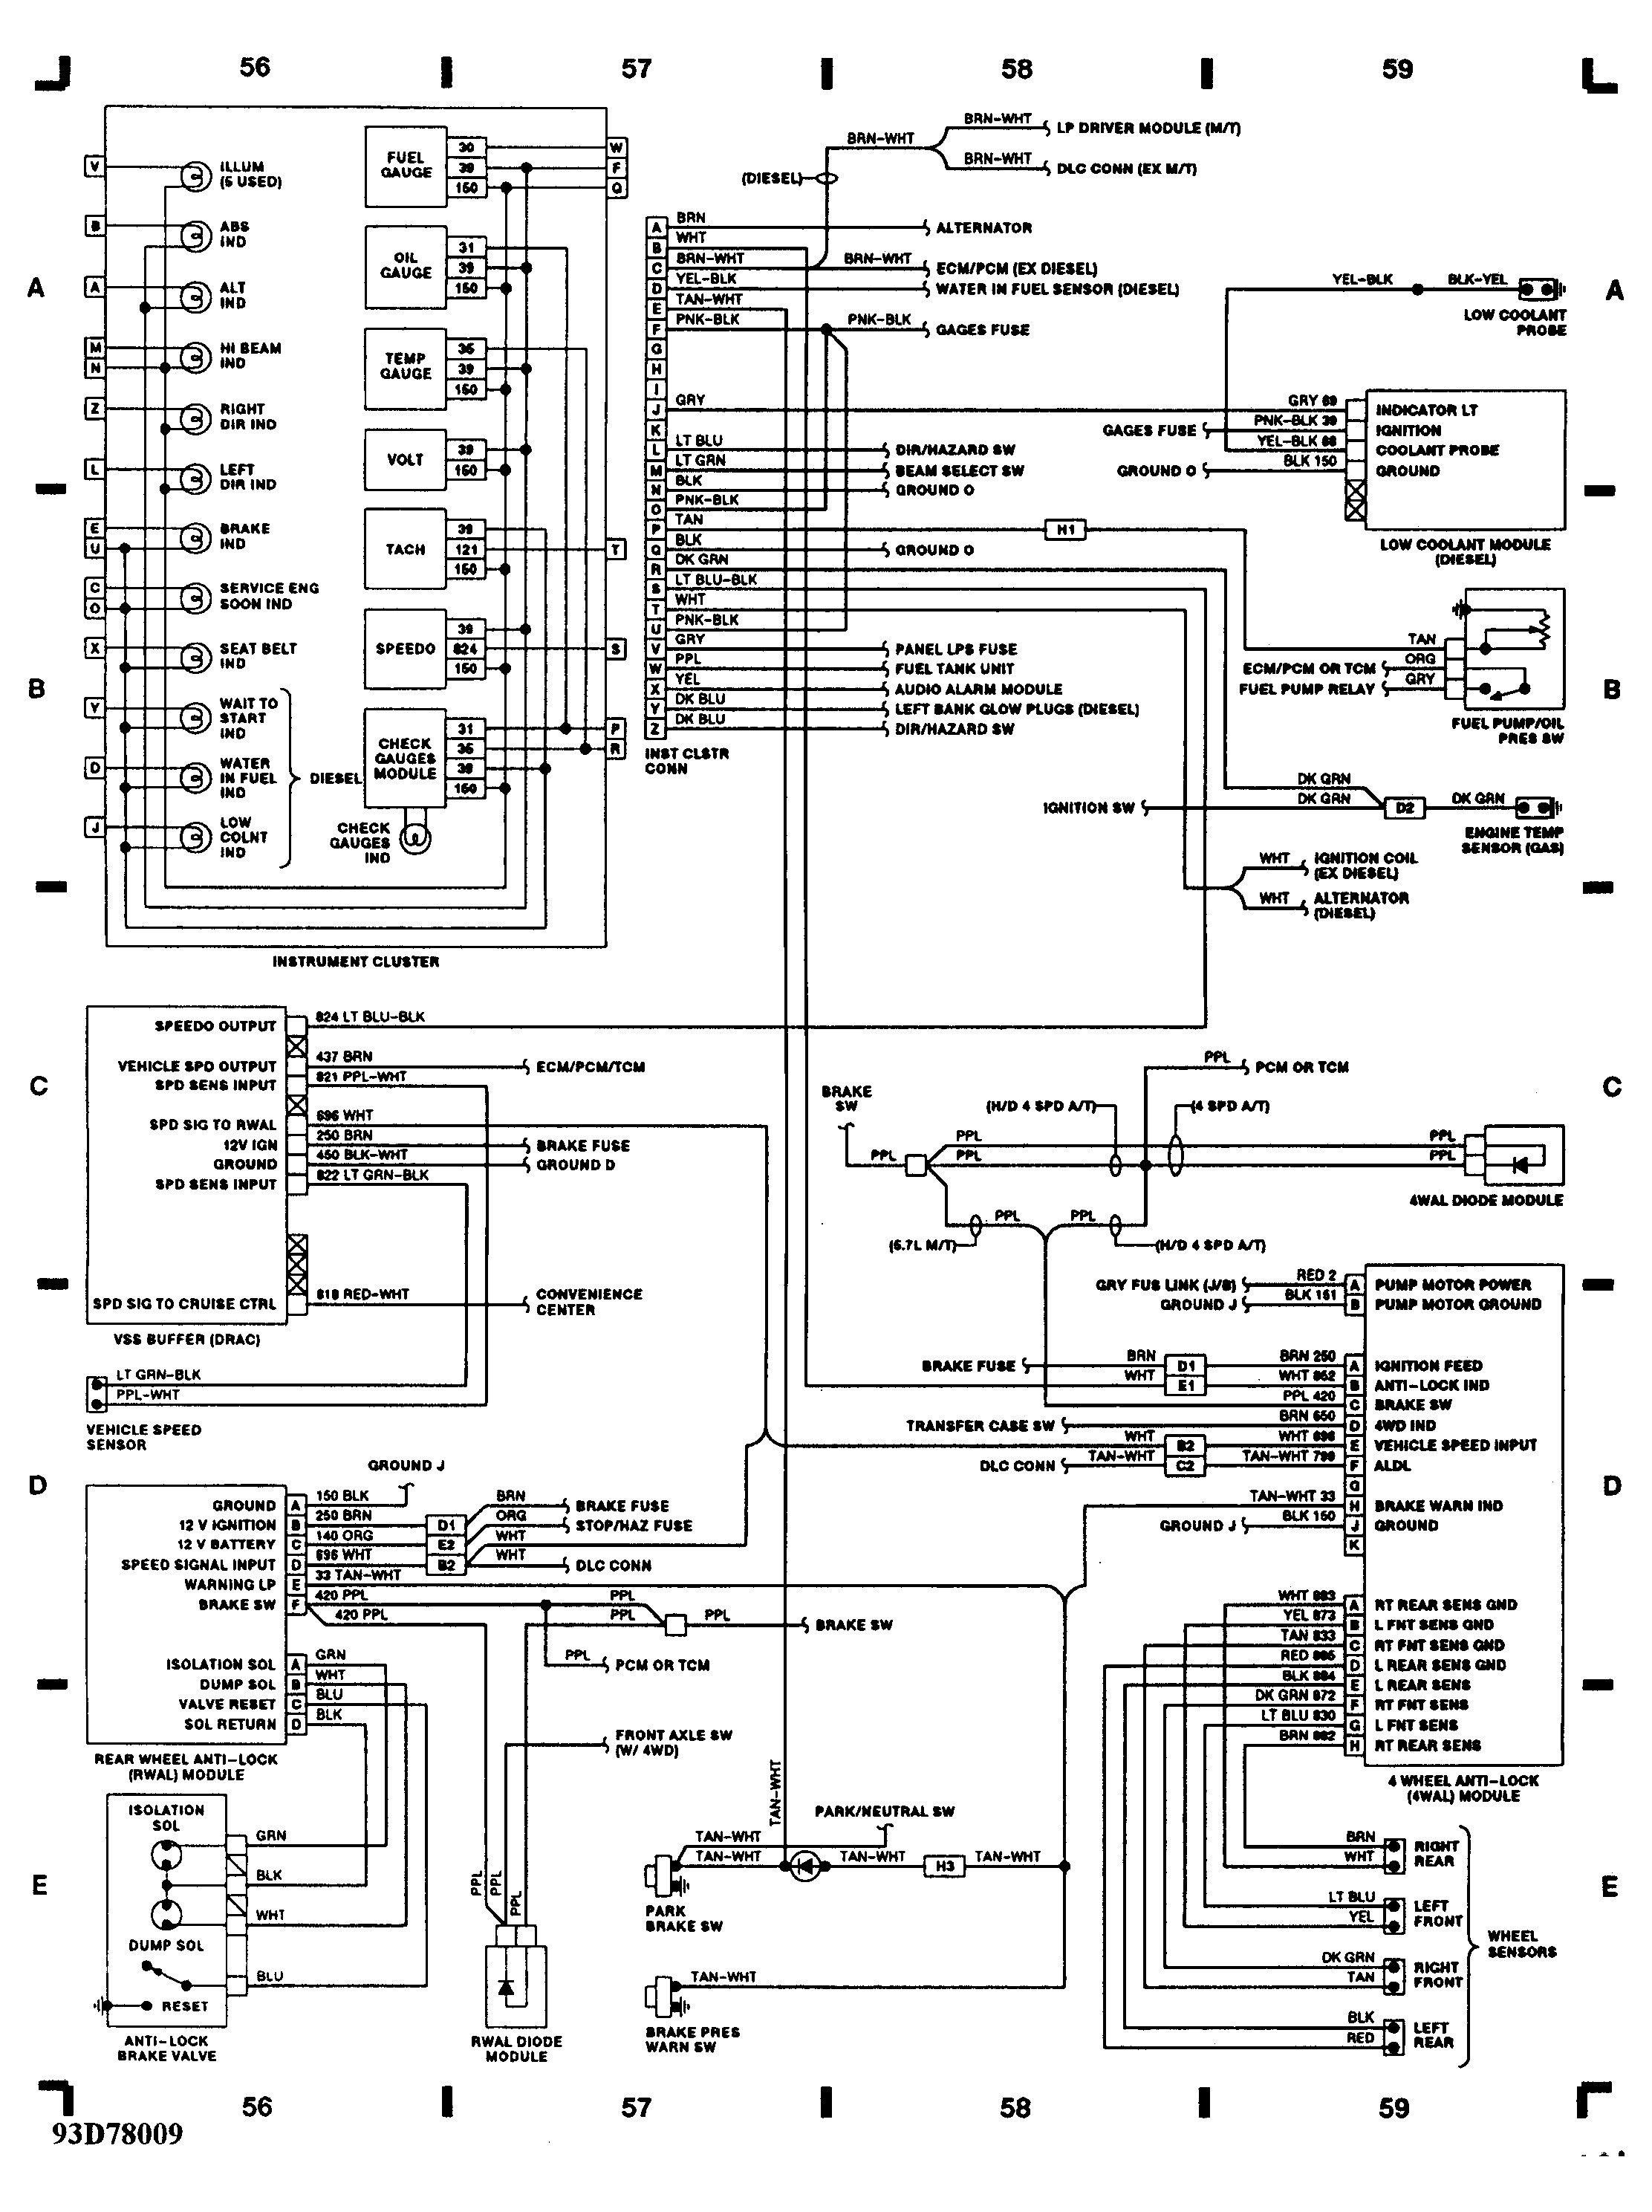 1999 Chevy Tahoe Engine Diagram Chevy Silverado House Wiring Chevy